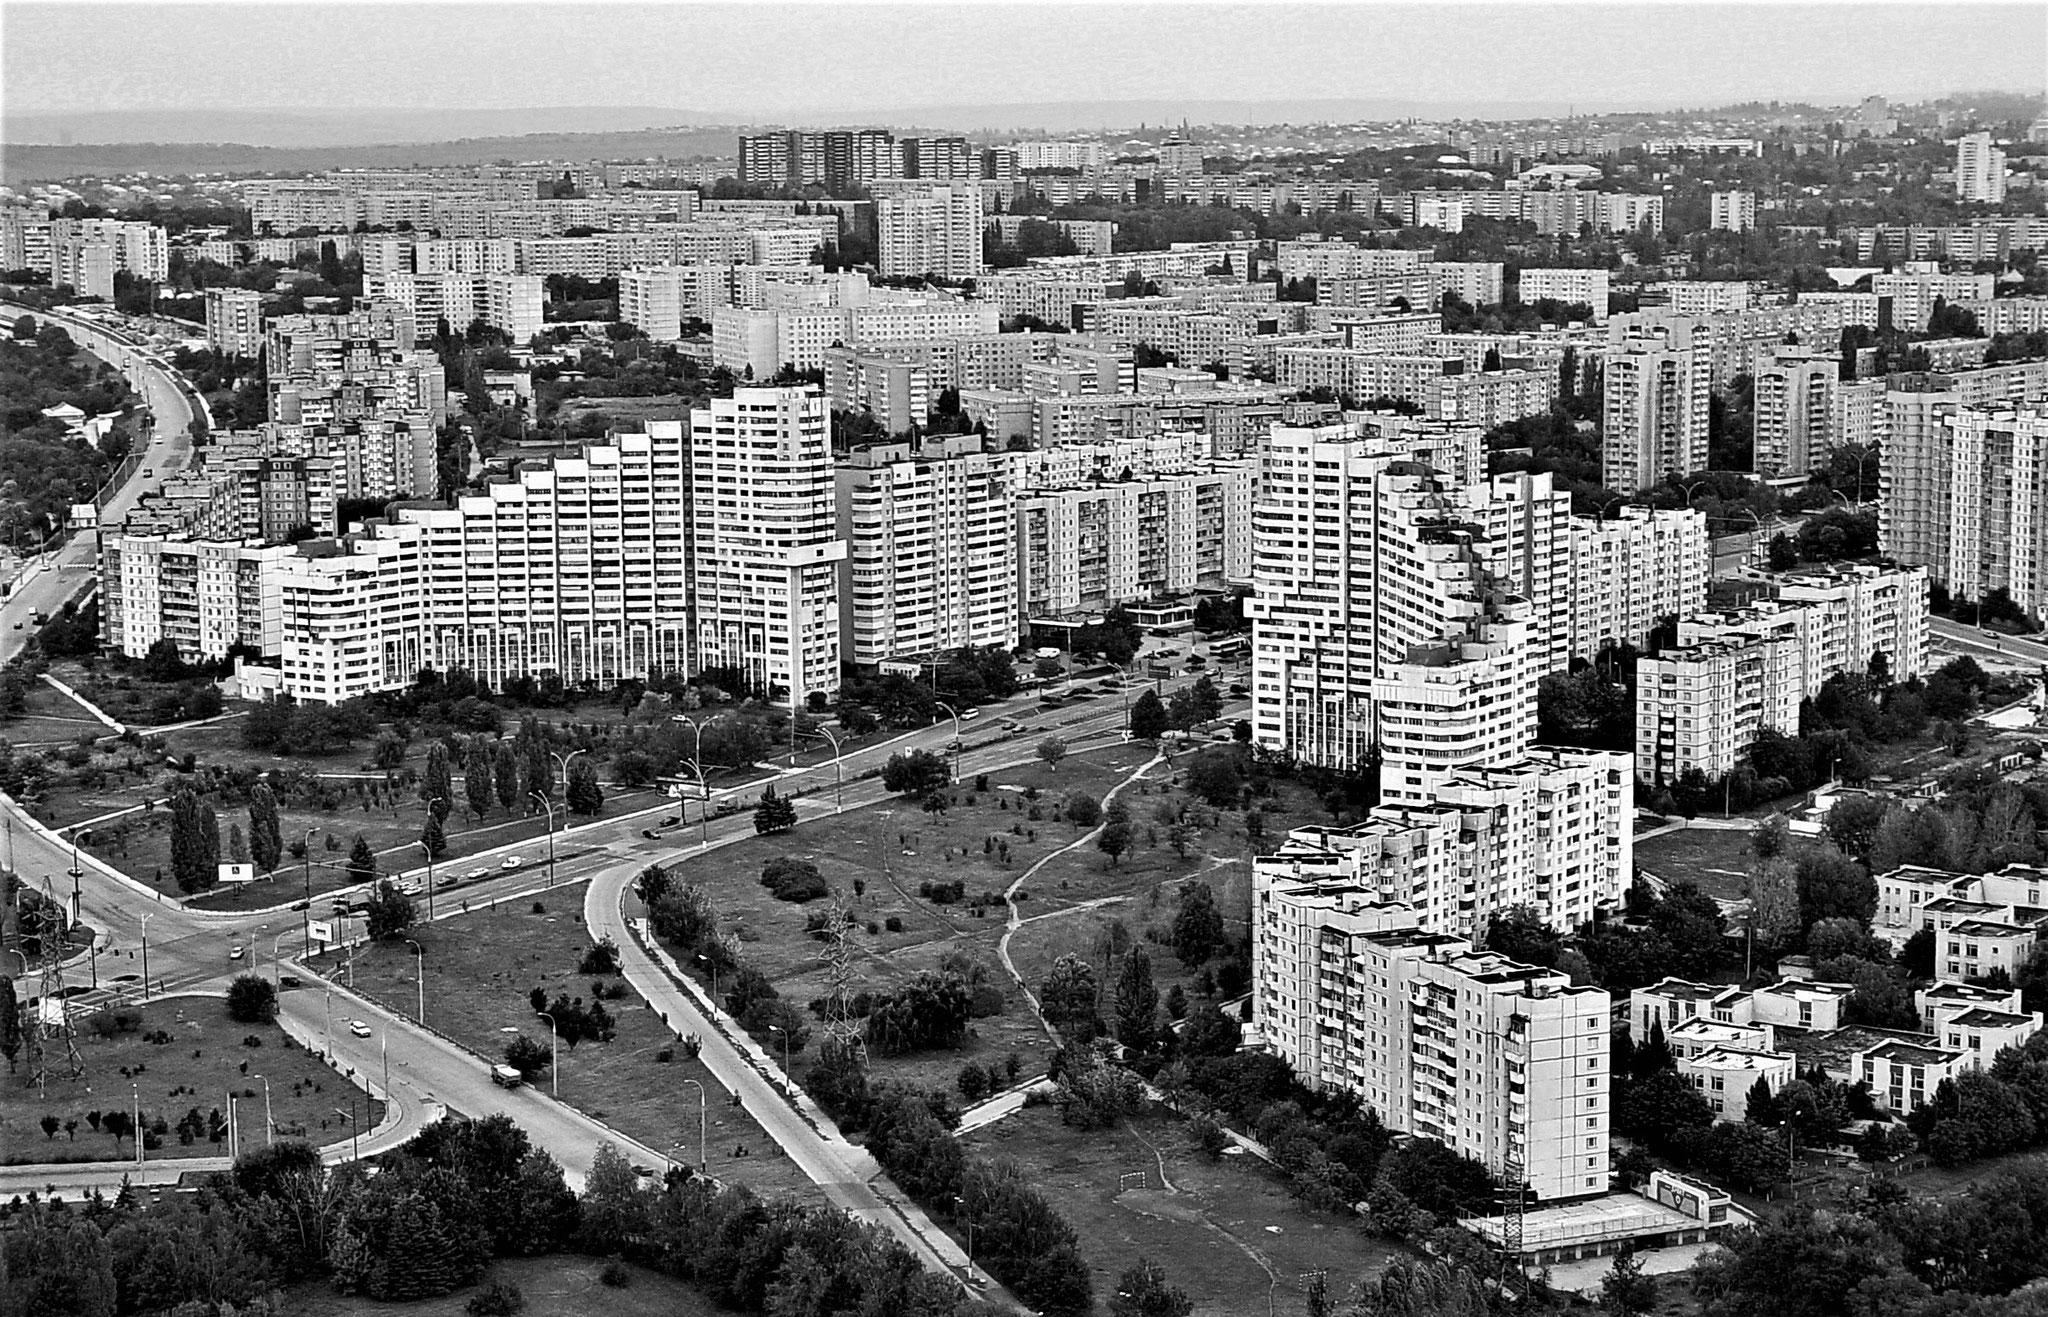 058-Iurie FOCA (Chișinău - MD) - Chișinău 1 (MD)